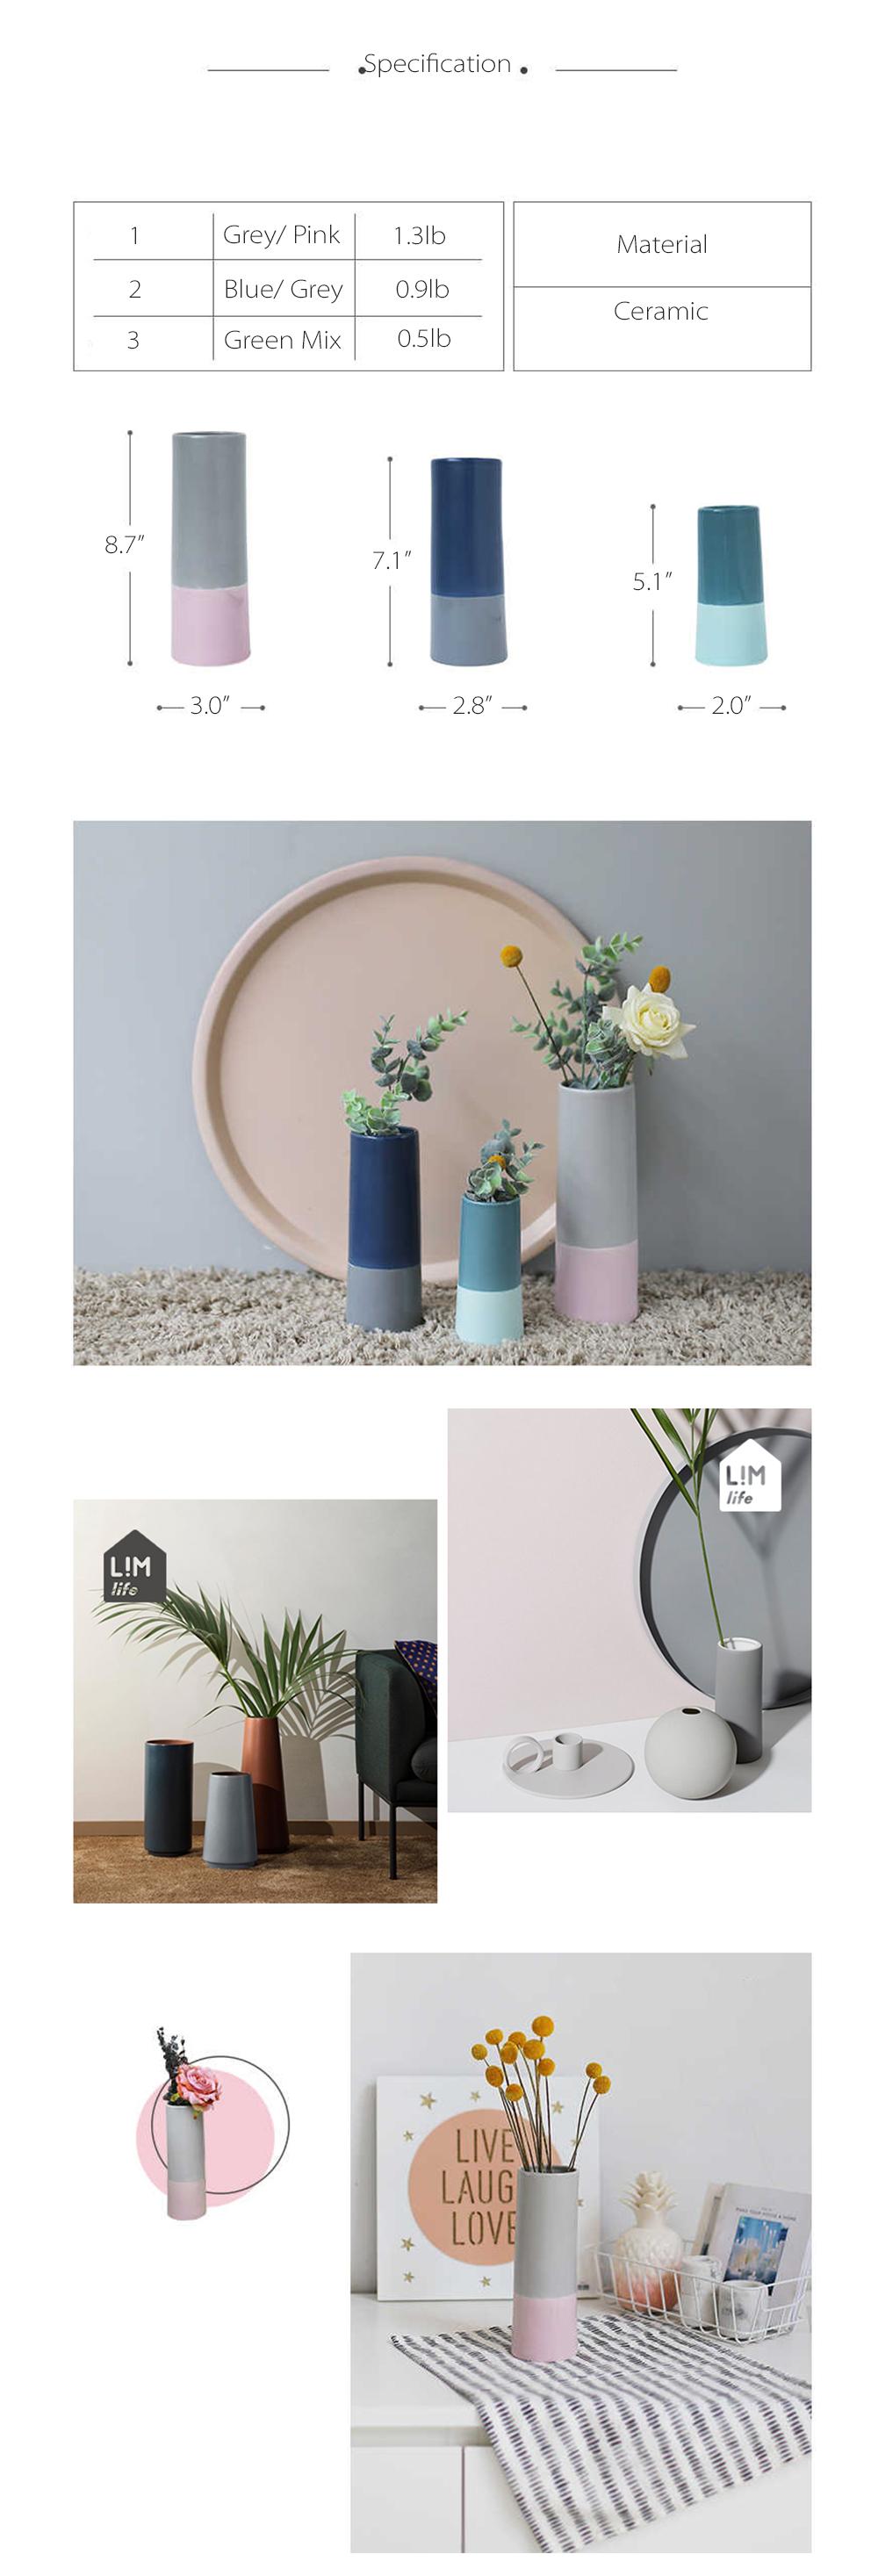 Mosaic Porcelain Vase Elegant and Colorful Vases